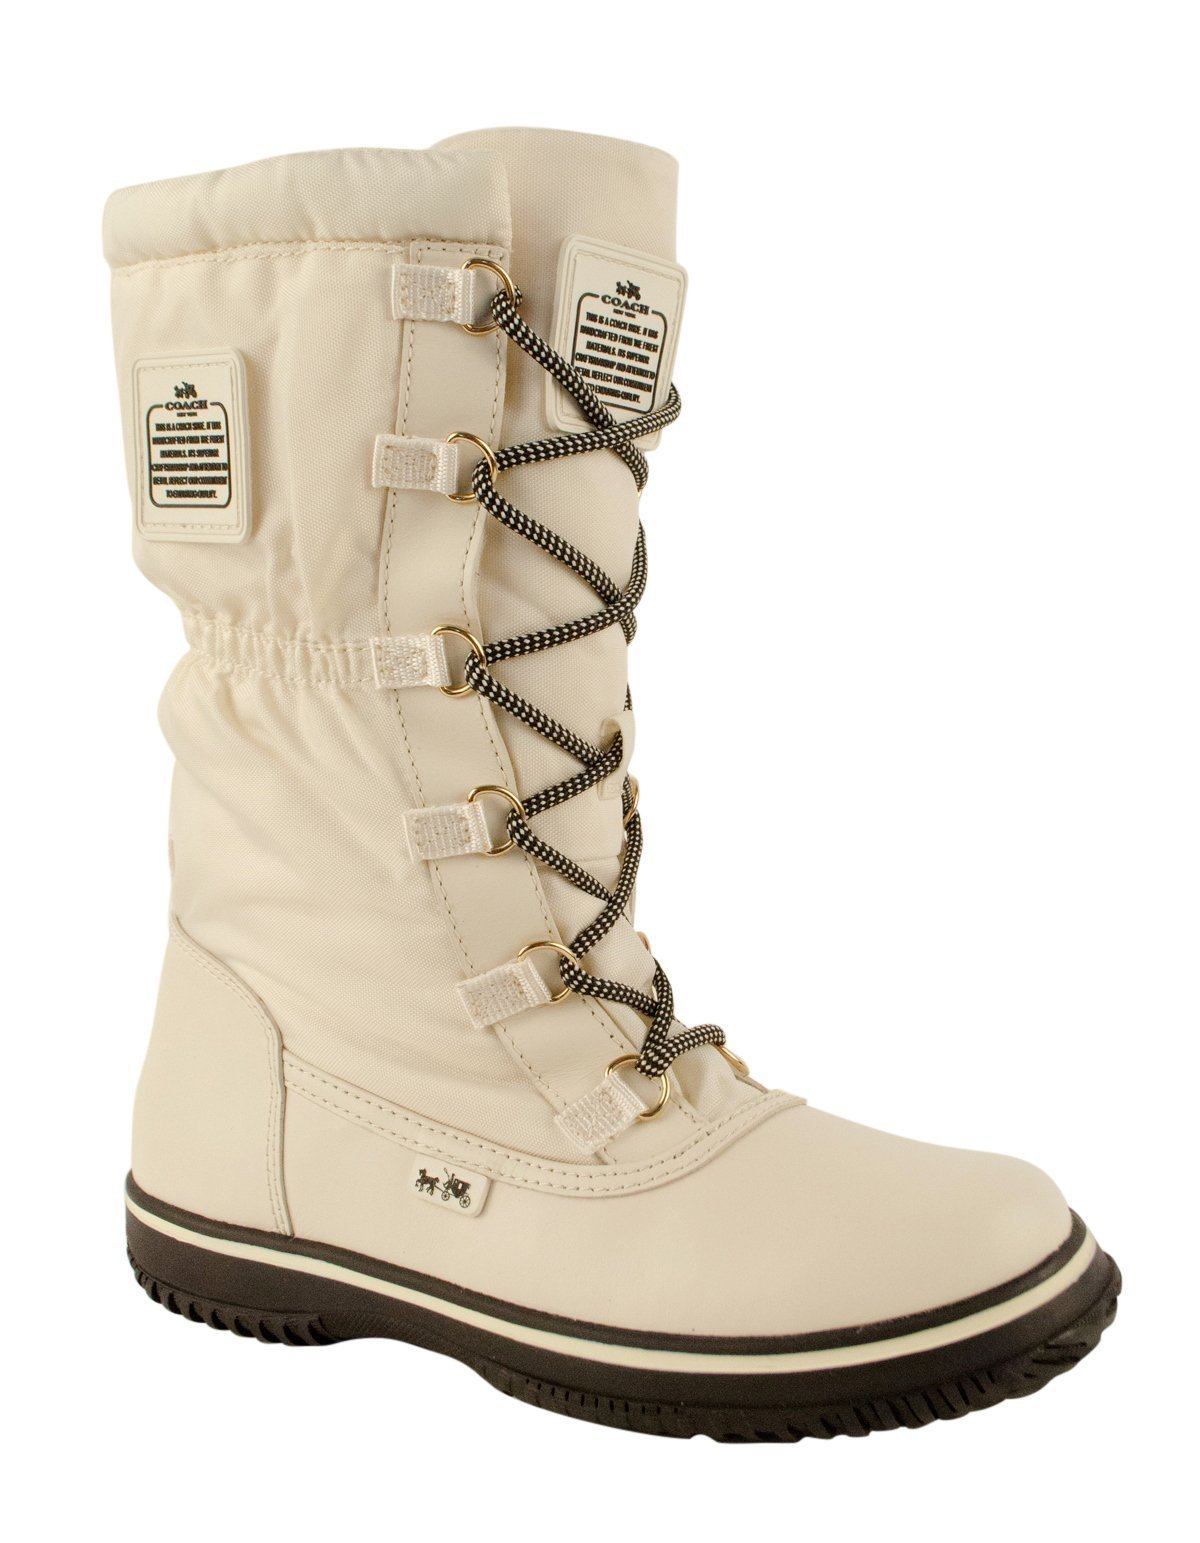 Coach Women¡¯s Sage Chalk/Chalk Lace-Up Cold Weather Boots 8.5 (B) M, Style A9177